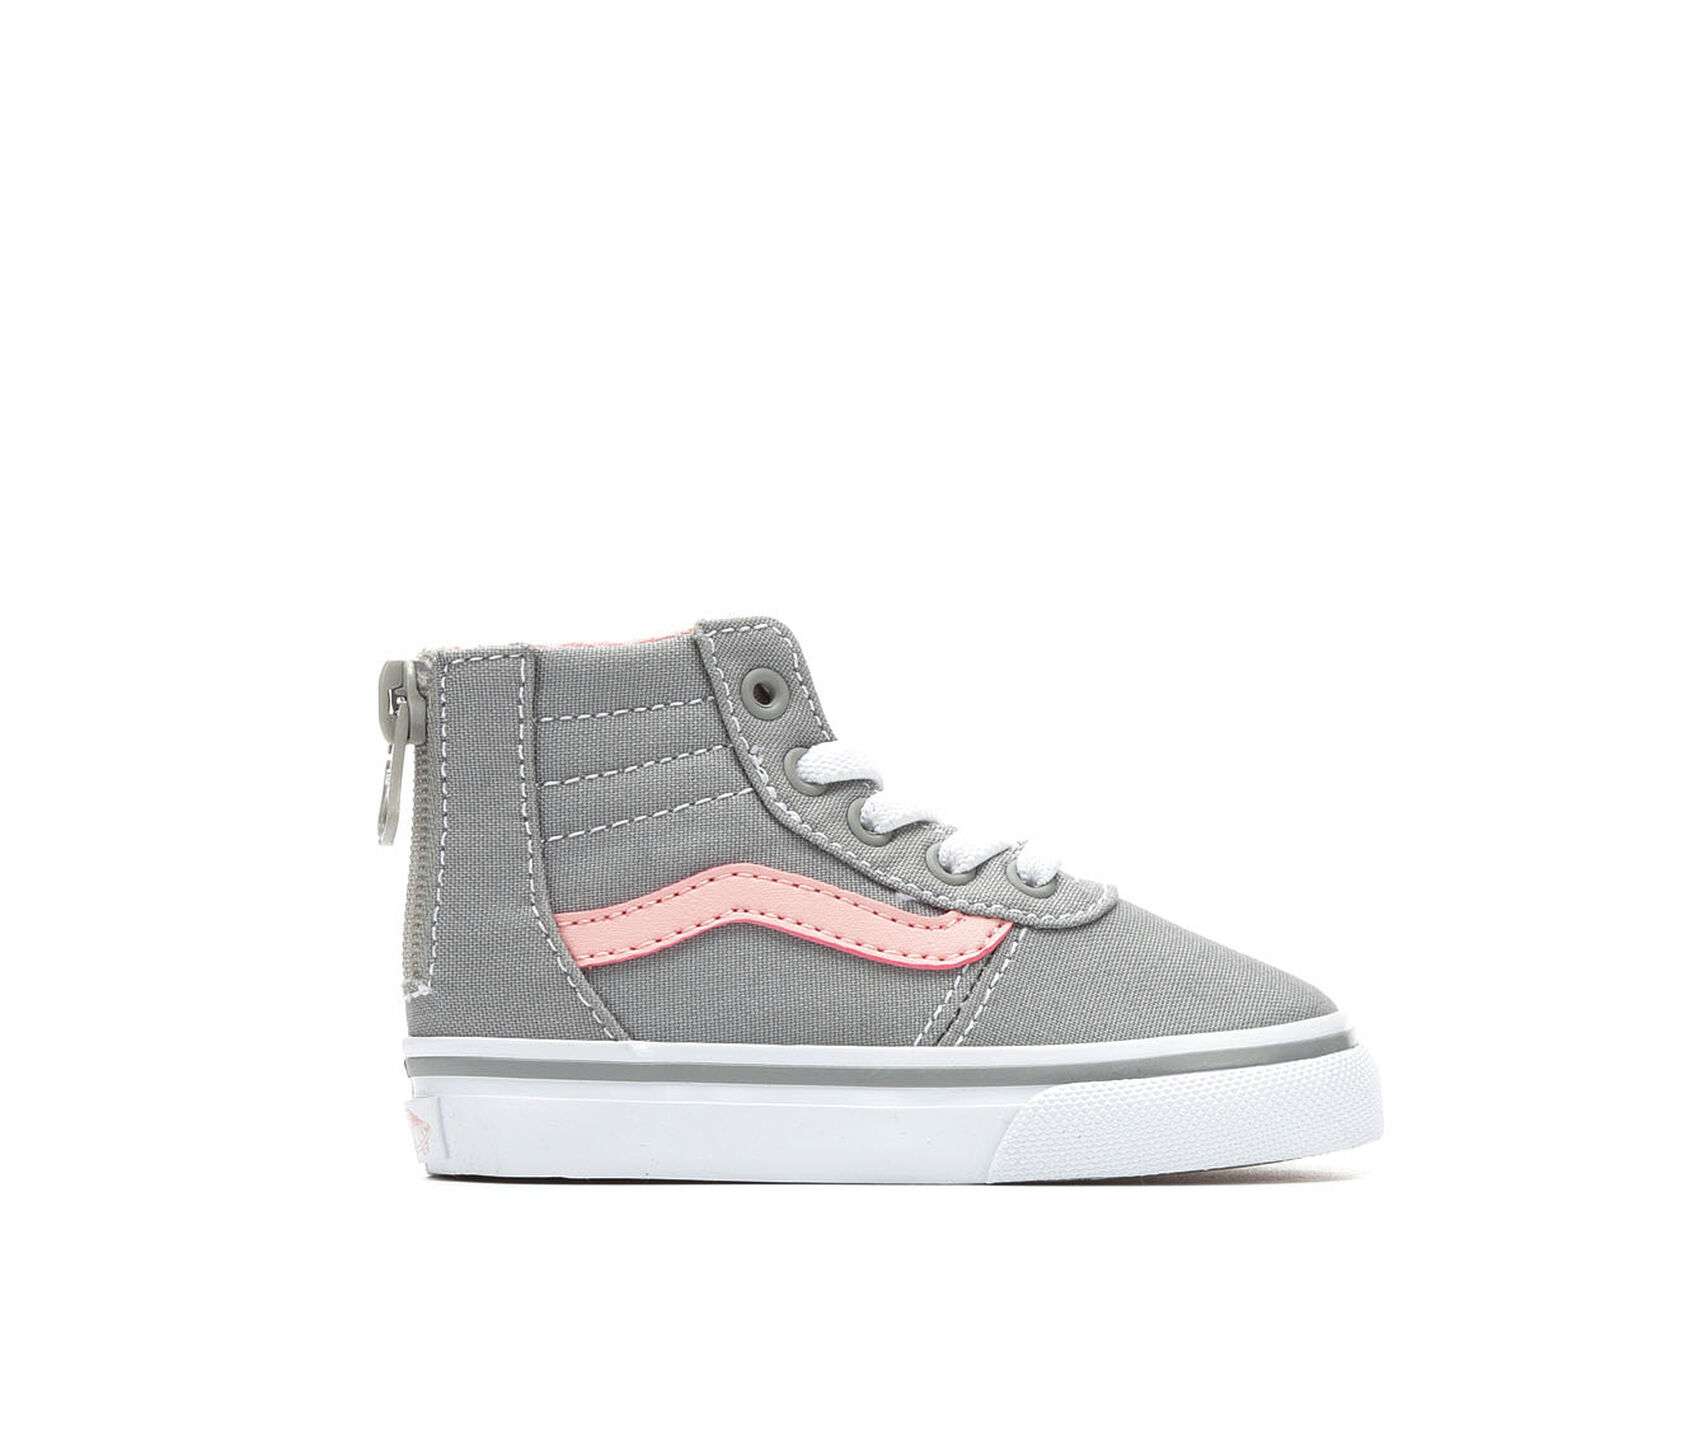 Girls Vans Infant Toddler Maddie Hi Zip High Top Skate Shoes Sneakers Previous